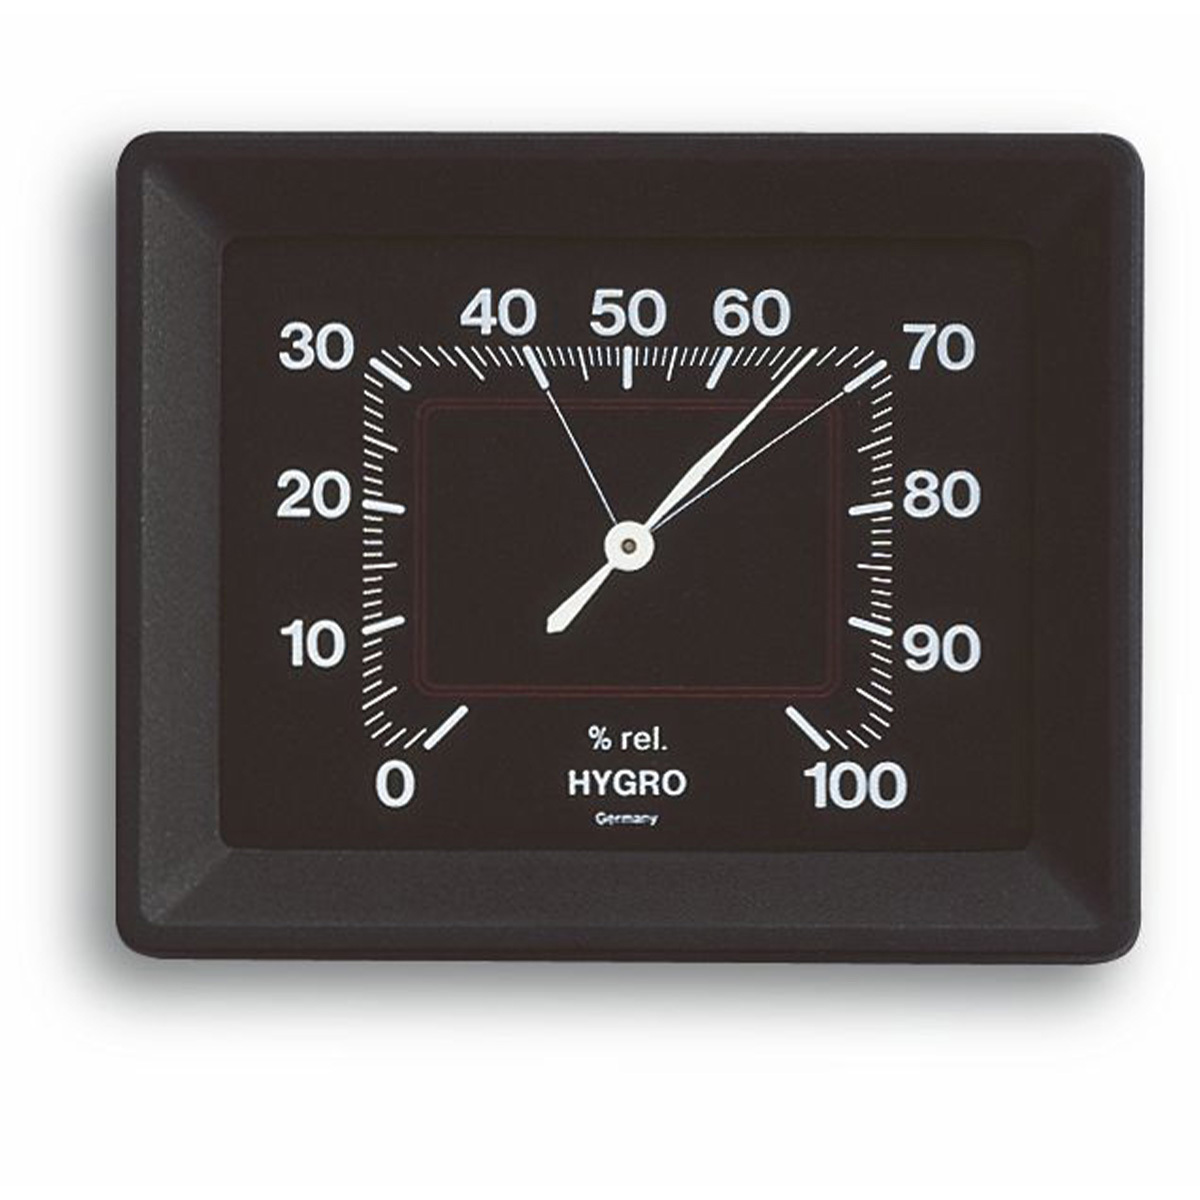 44-1004-analoges-hygrometer-1200x1200px.jpg